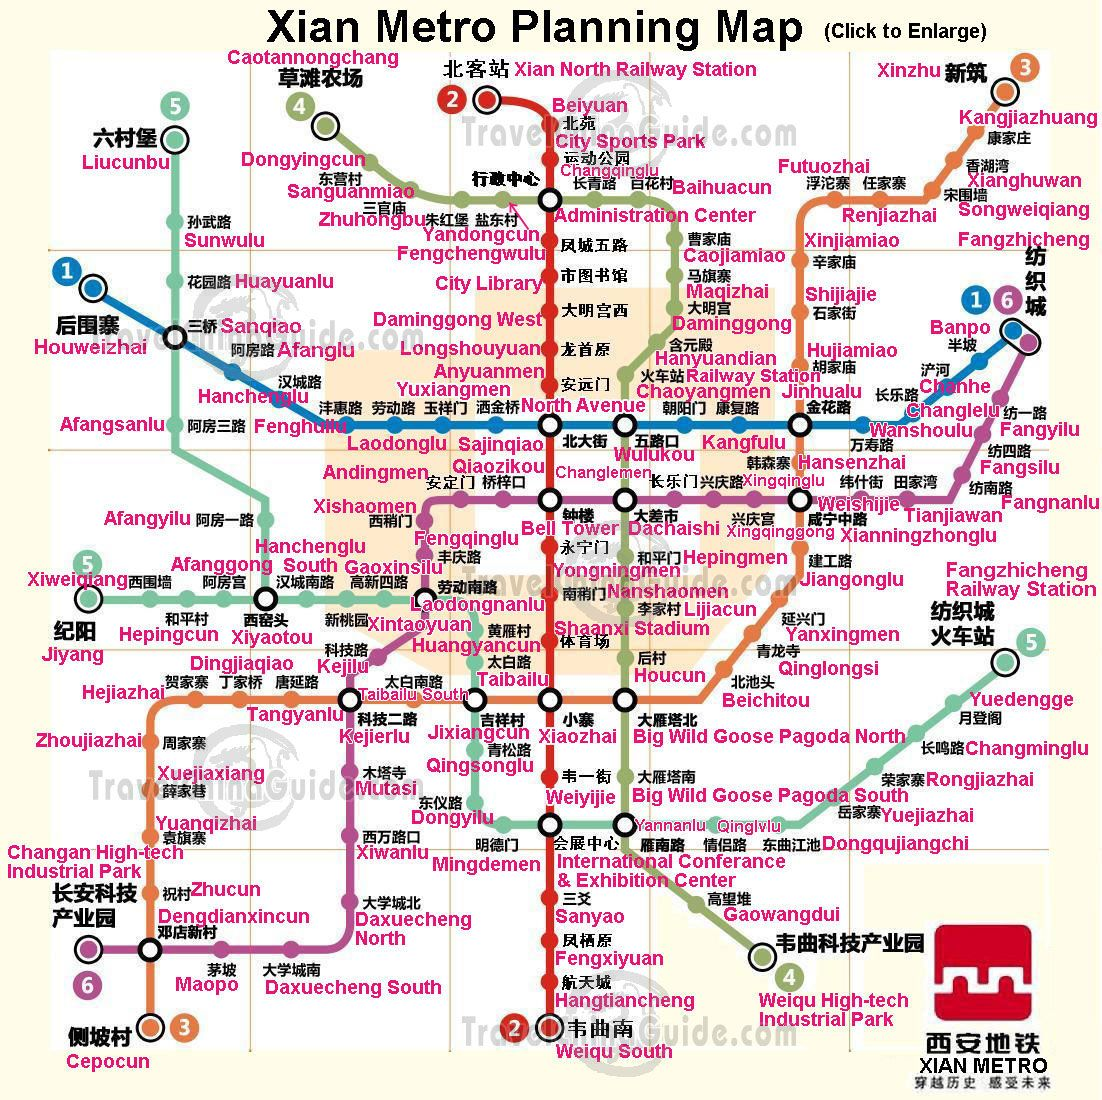 Xian Subway Maps Lines Stations Subway Map Beijing Subway Map Transit Map